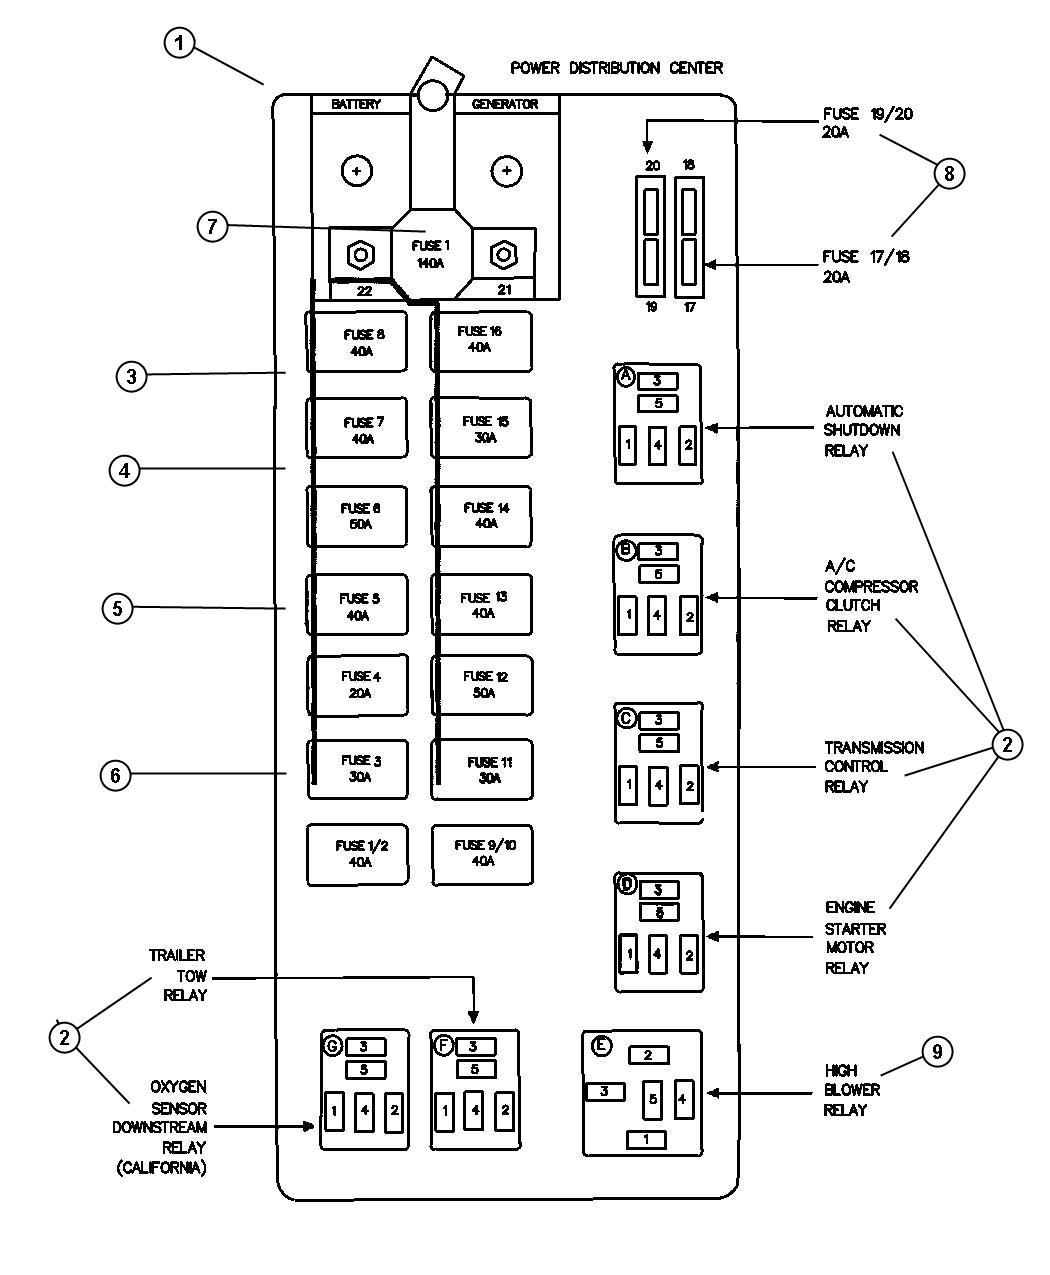 Dodge Ram 3500 Fusible link. 140 amp. 06101757, 140 amp